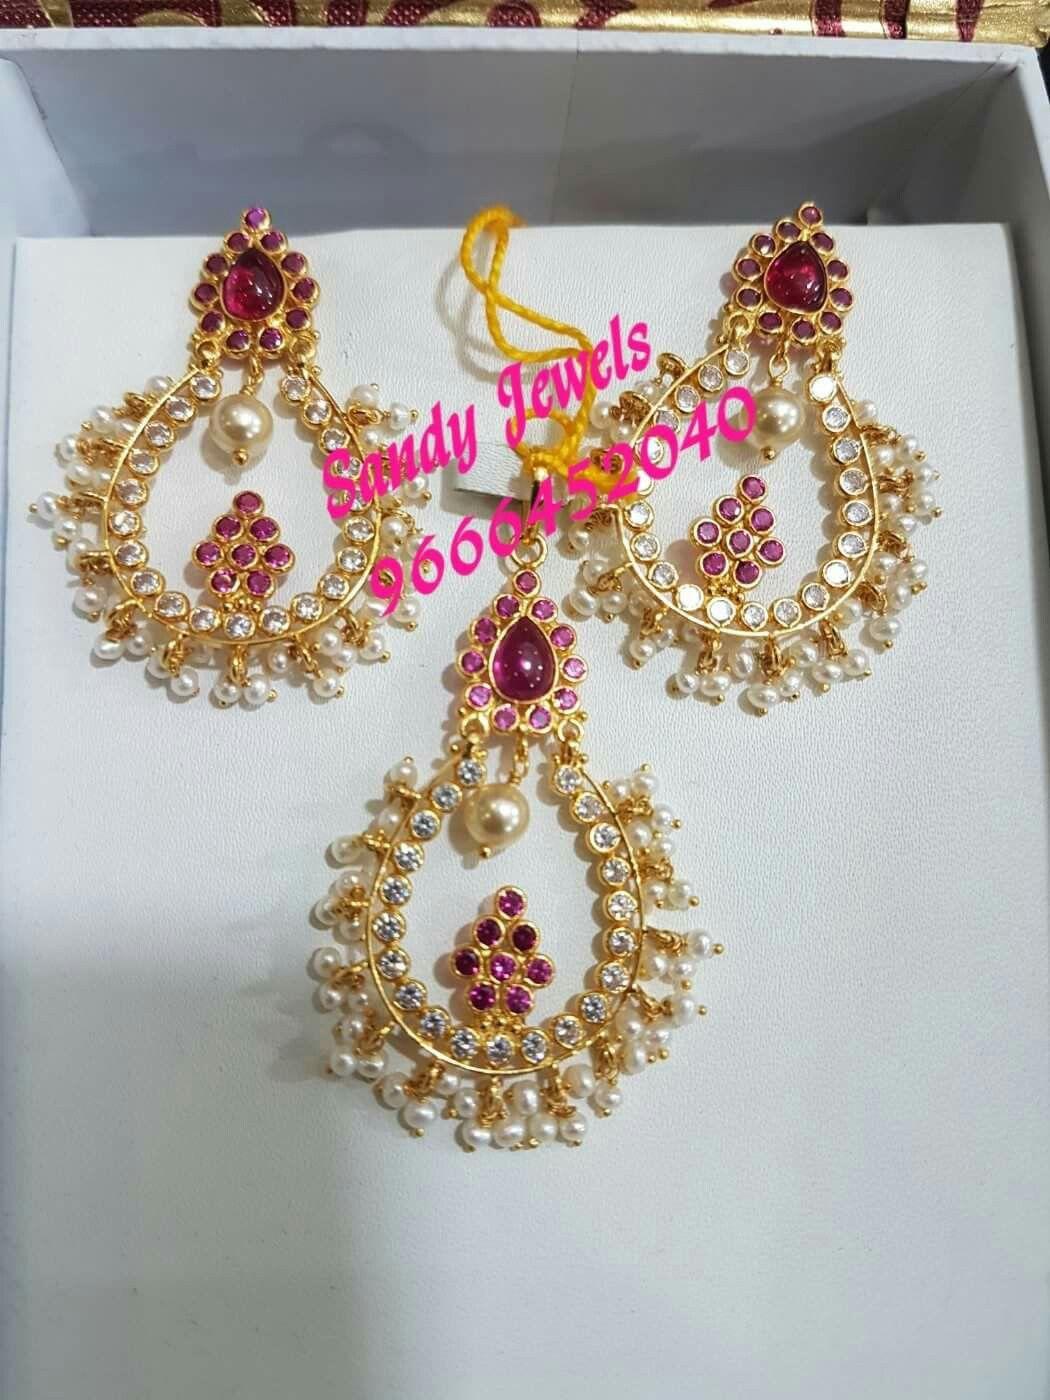 Goldjewelleryroyal gold jewellery royal pinterest ear rings